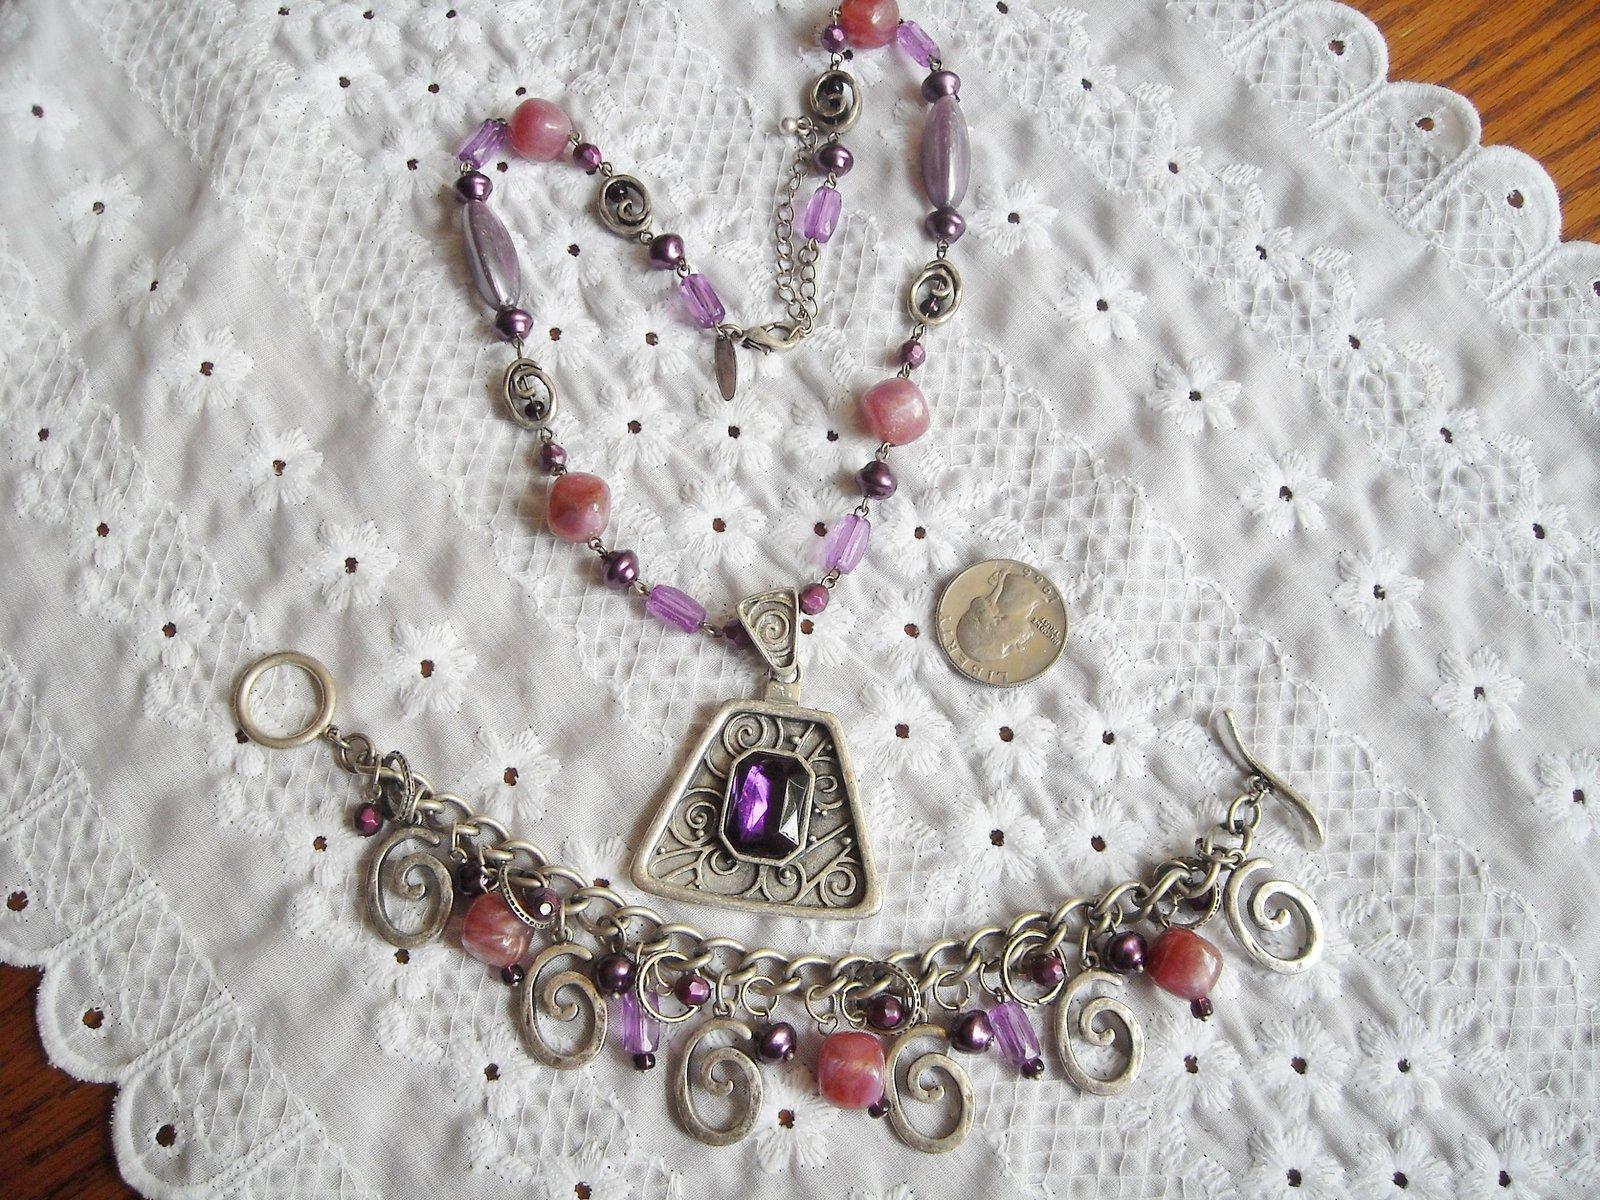 Vintage Necklace & Dangle Charm Bracelet Faux Stone & Pearl Purple Rhinestone